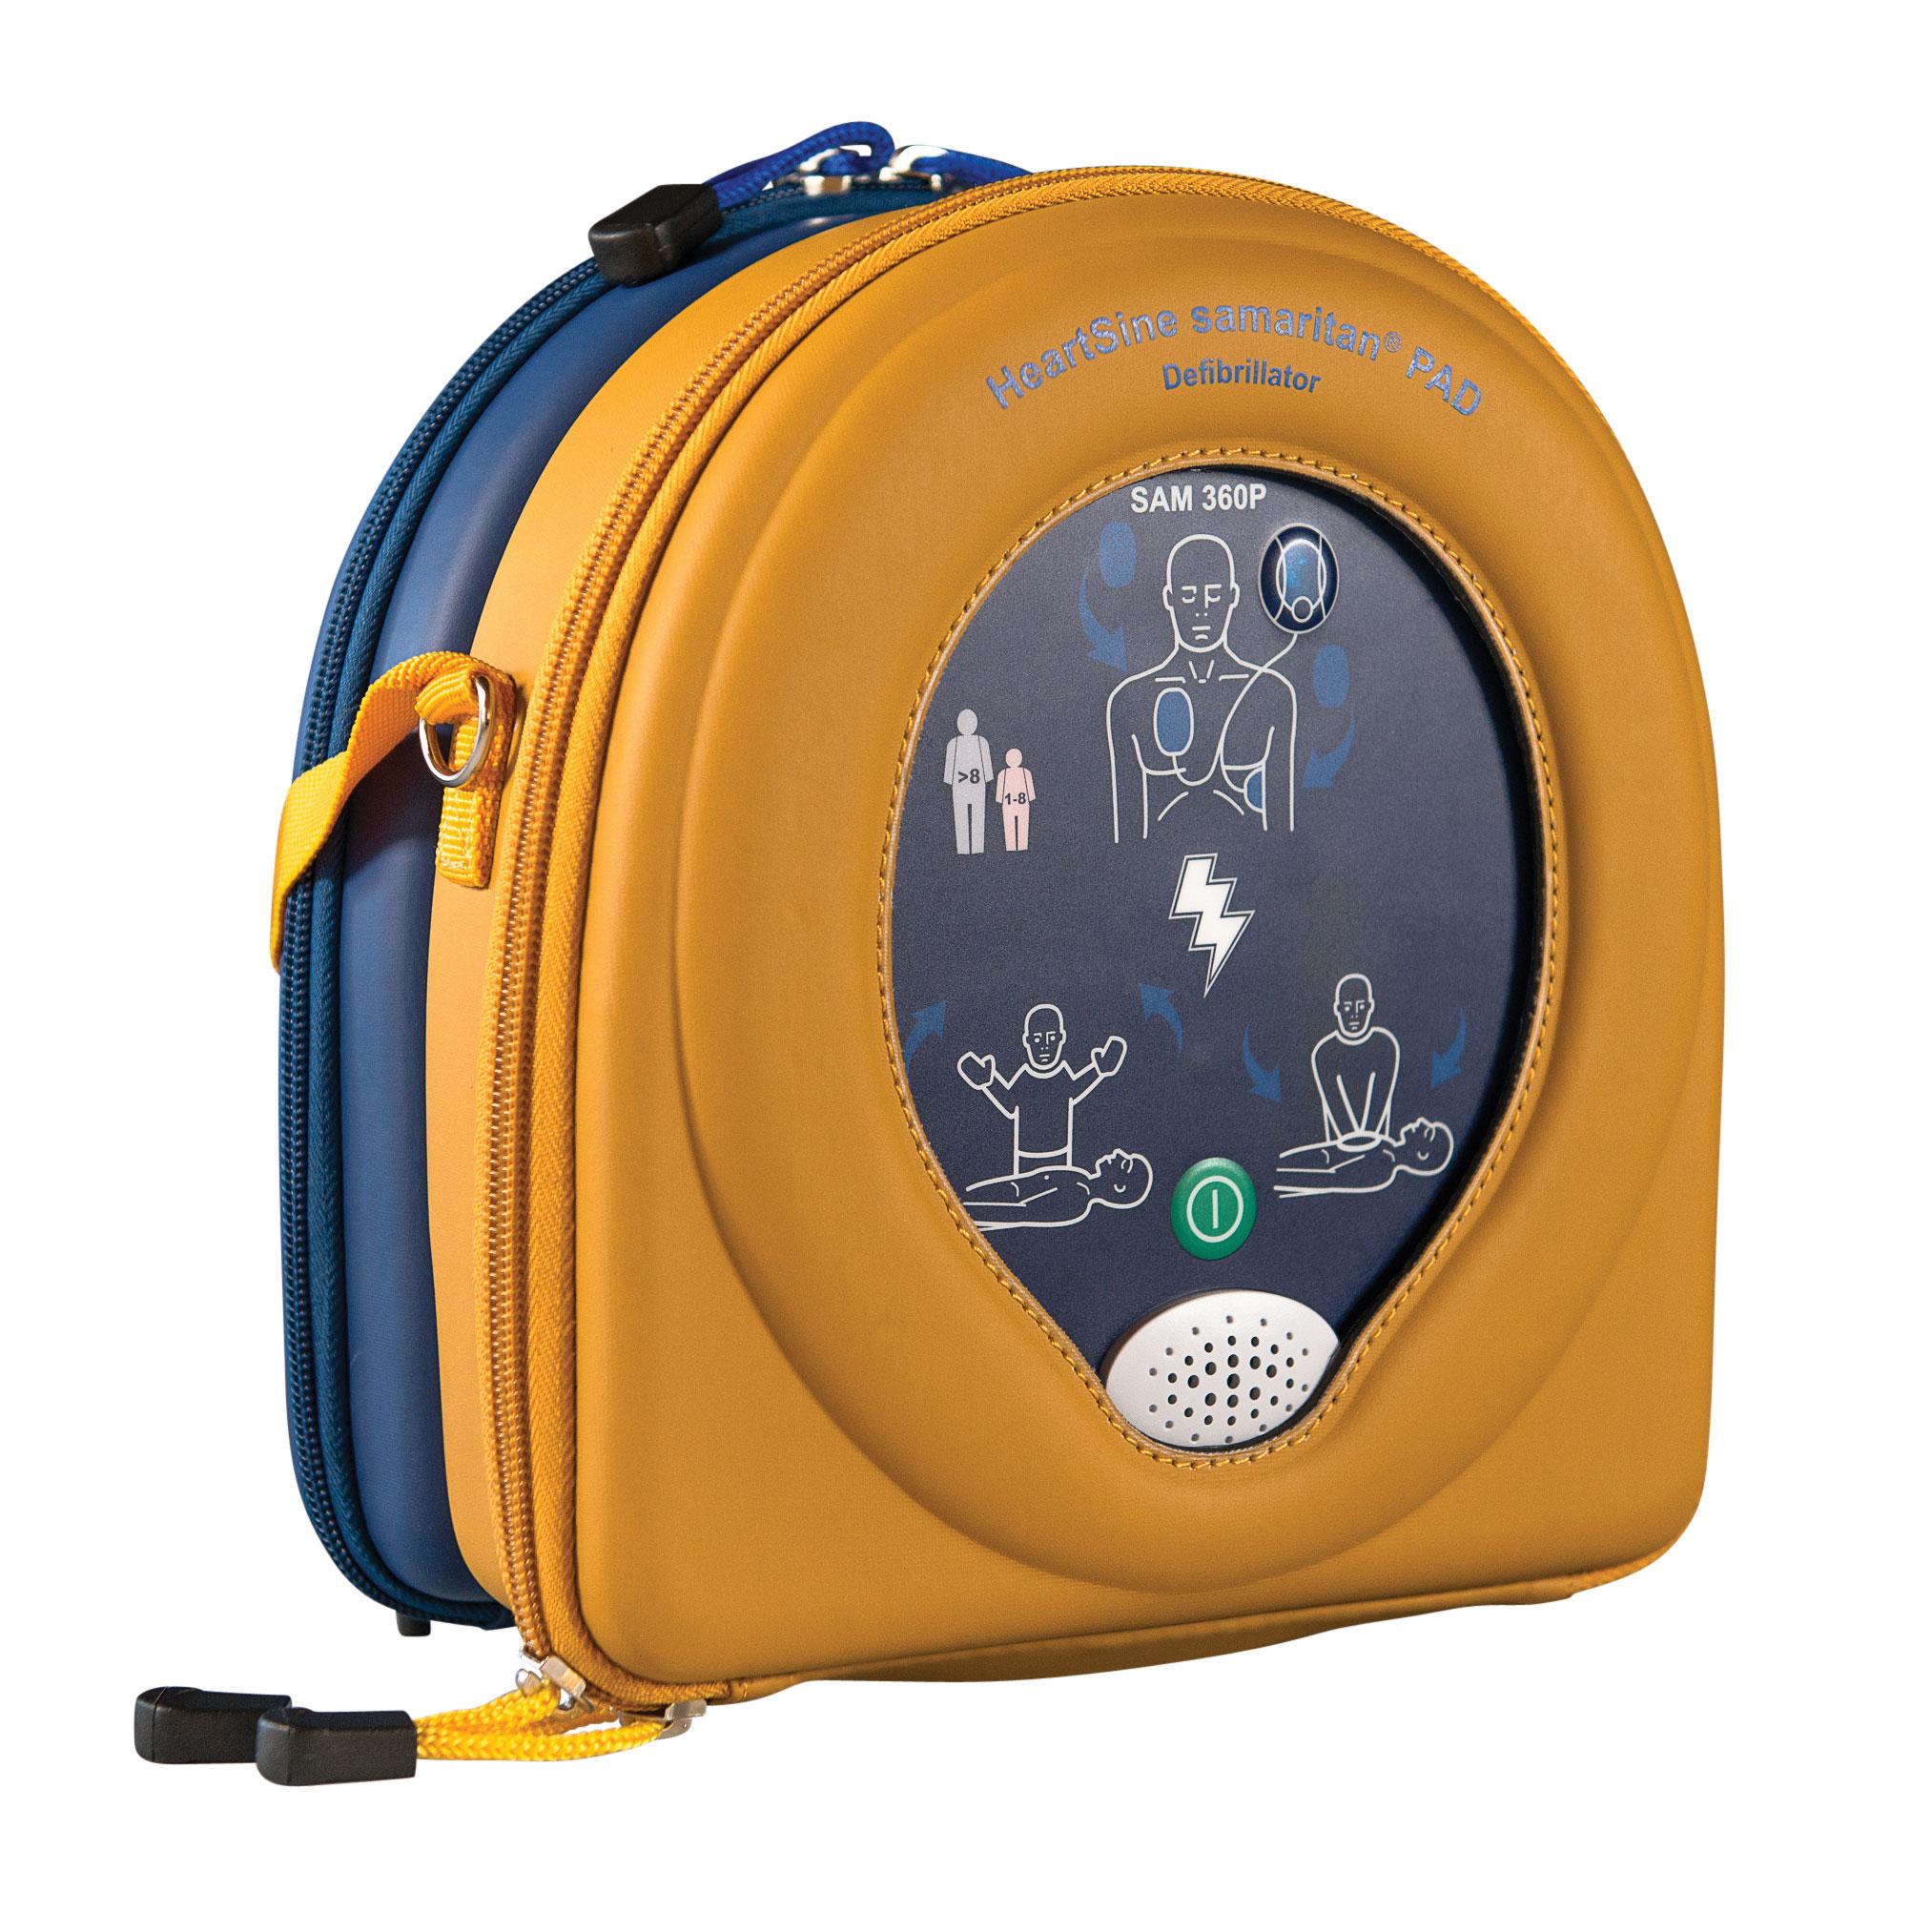 Defibrillaattori HeartSine Samaritan® PAD 360P